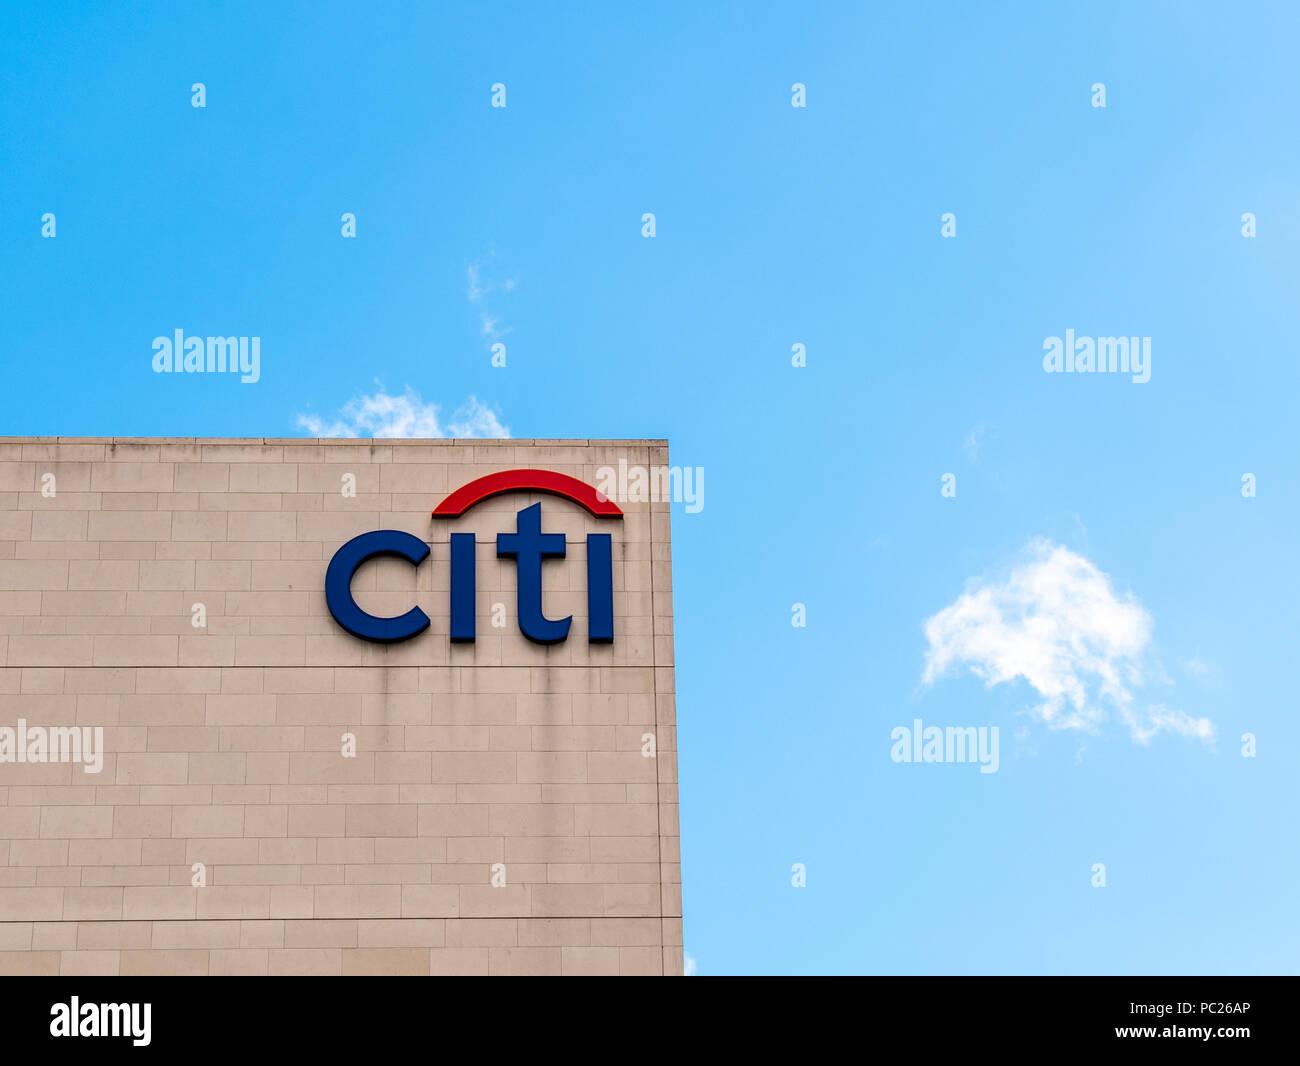 Citi, Gateway Offices, Titanic Quarter, Belfast against a blue sky - Stock Image